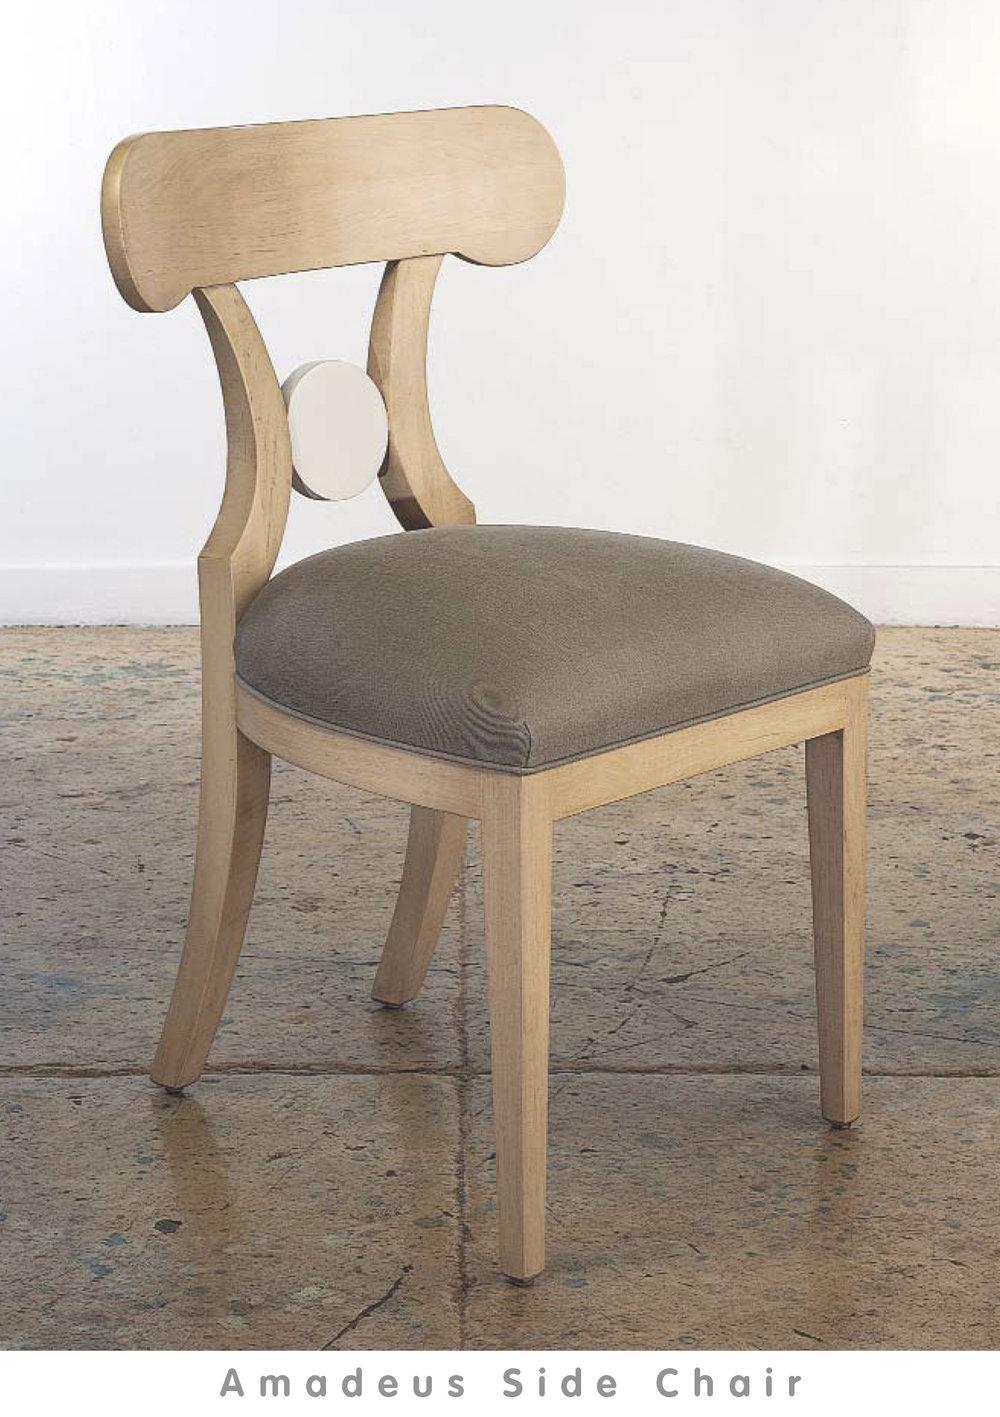 Amadeus Side Chair